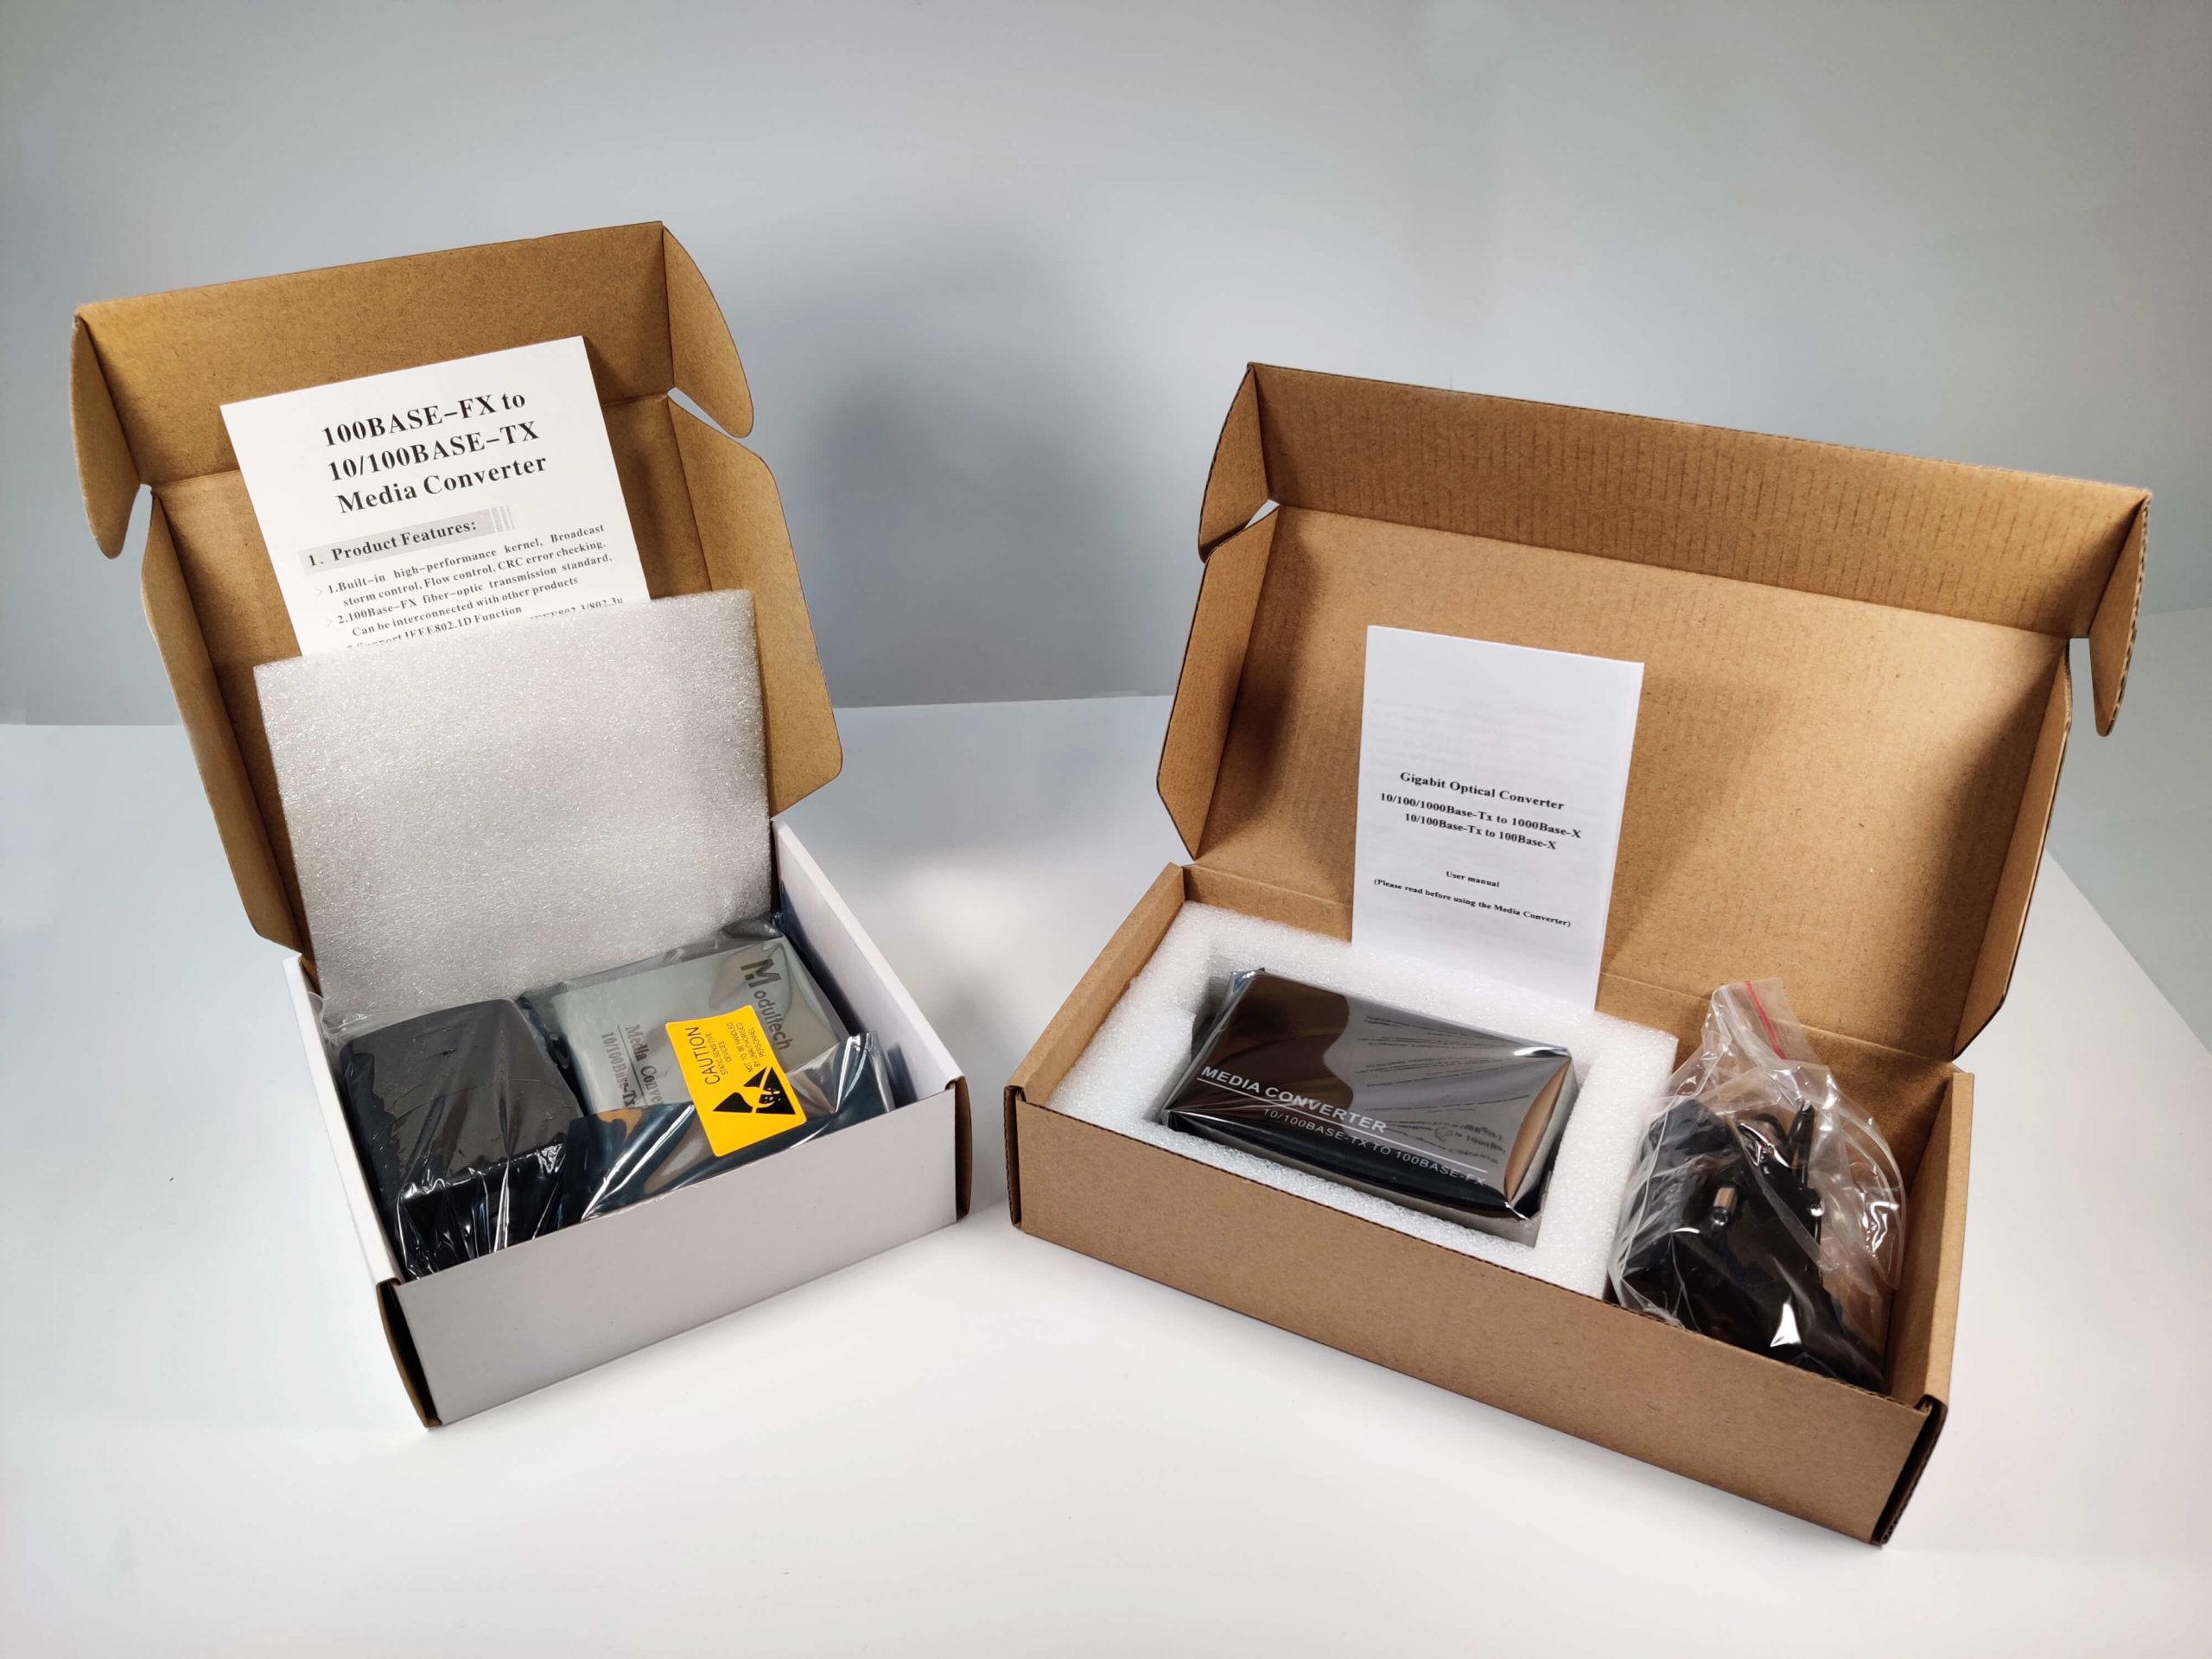 Открытые коробки с медиаконвертерами